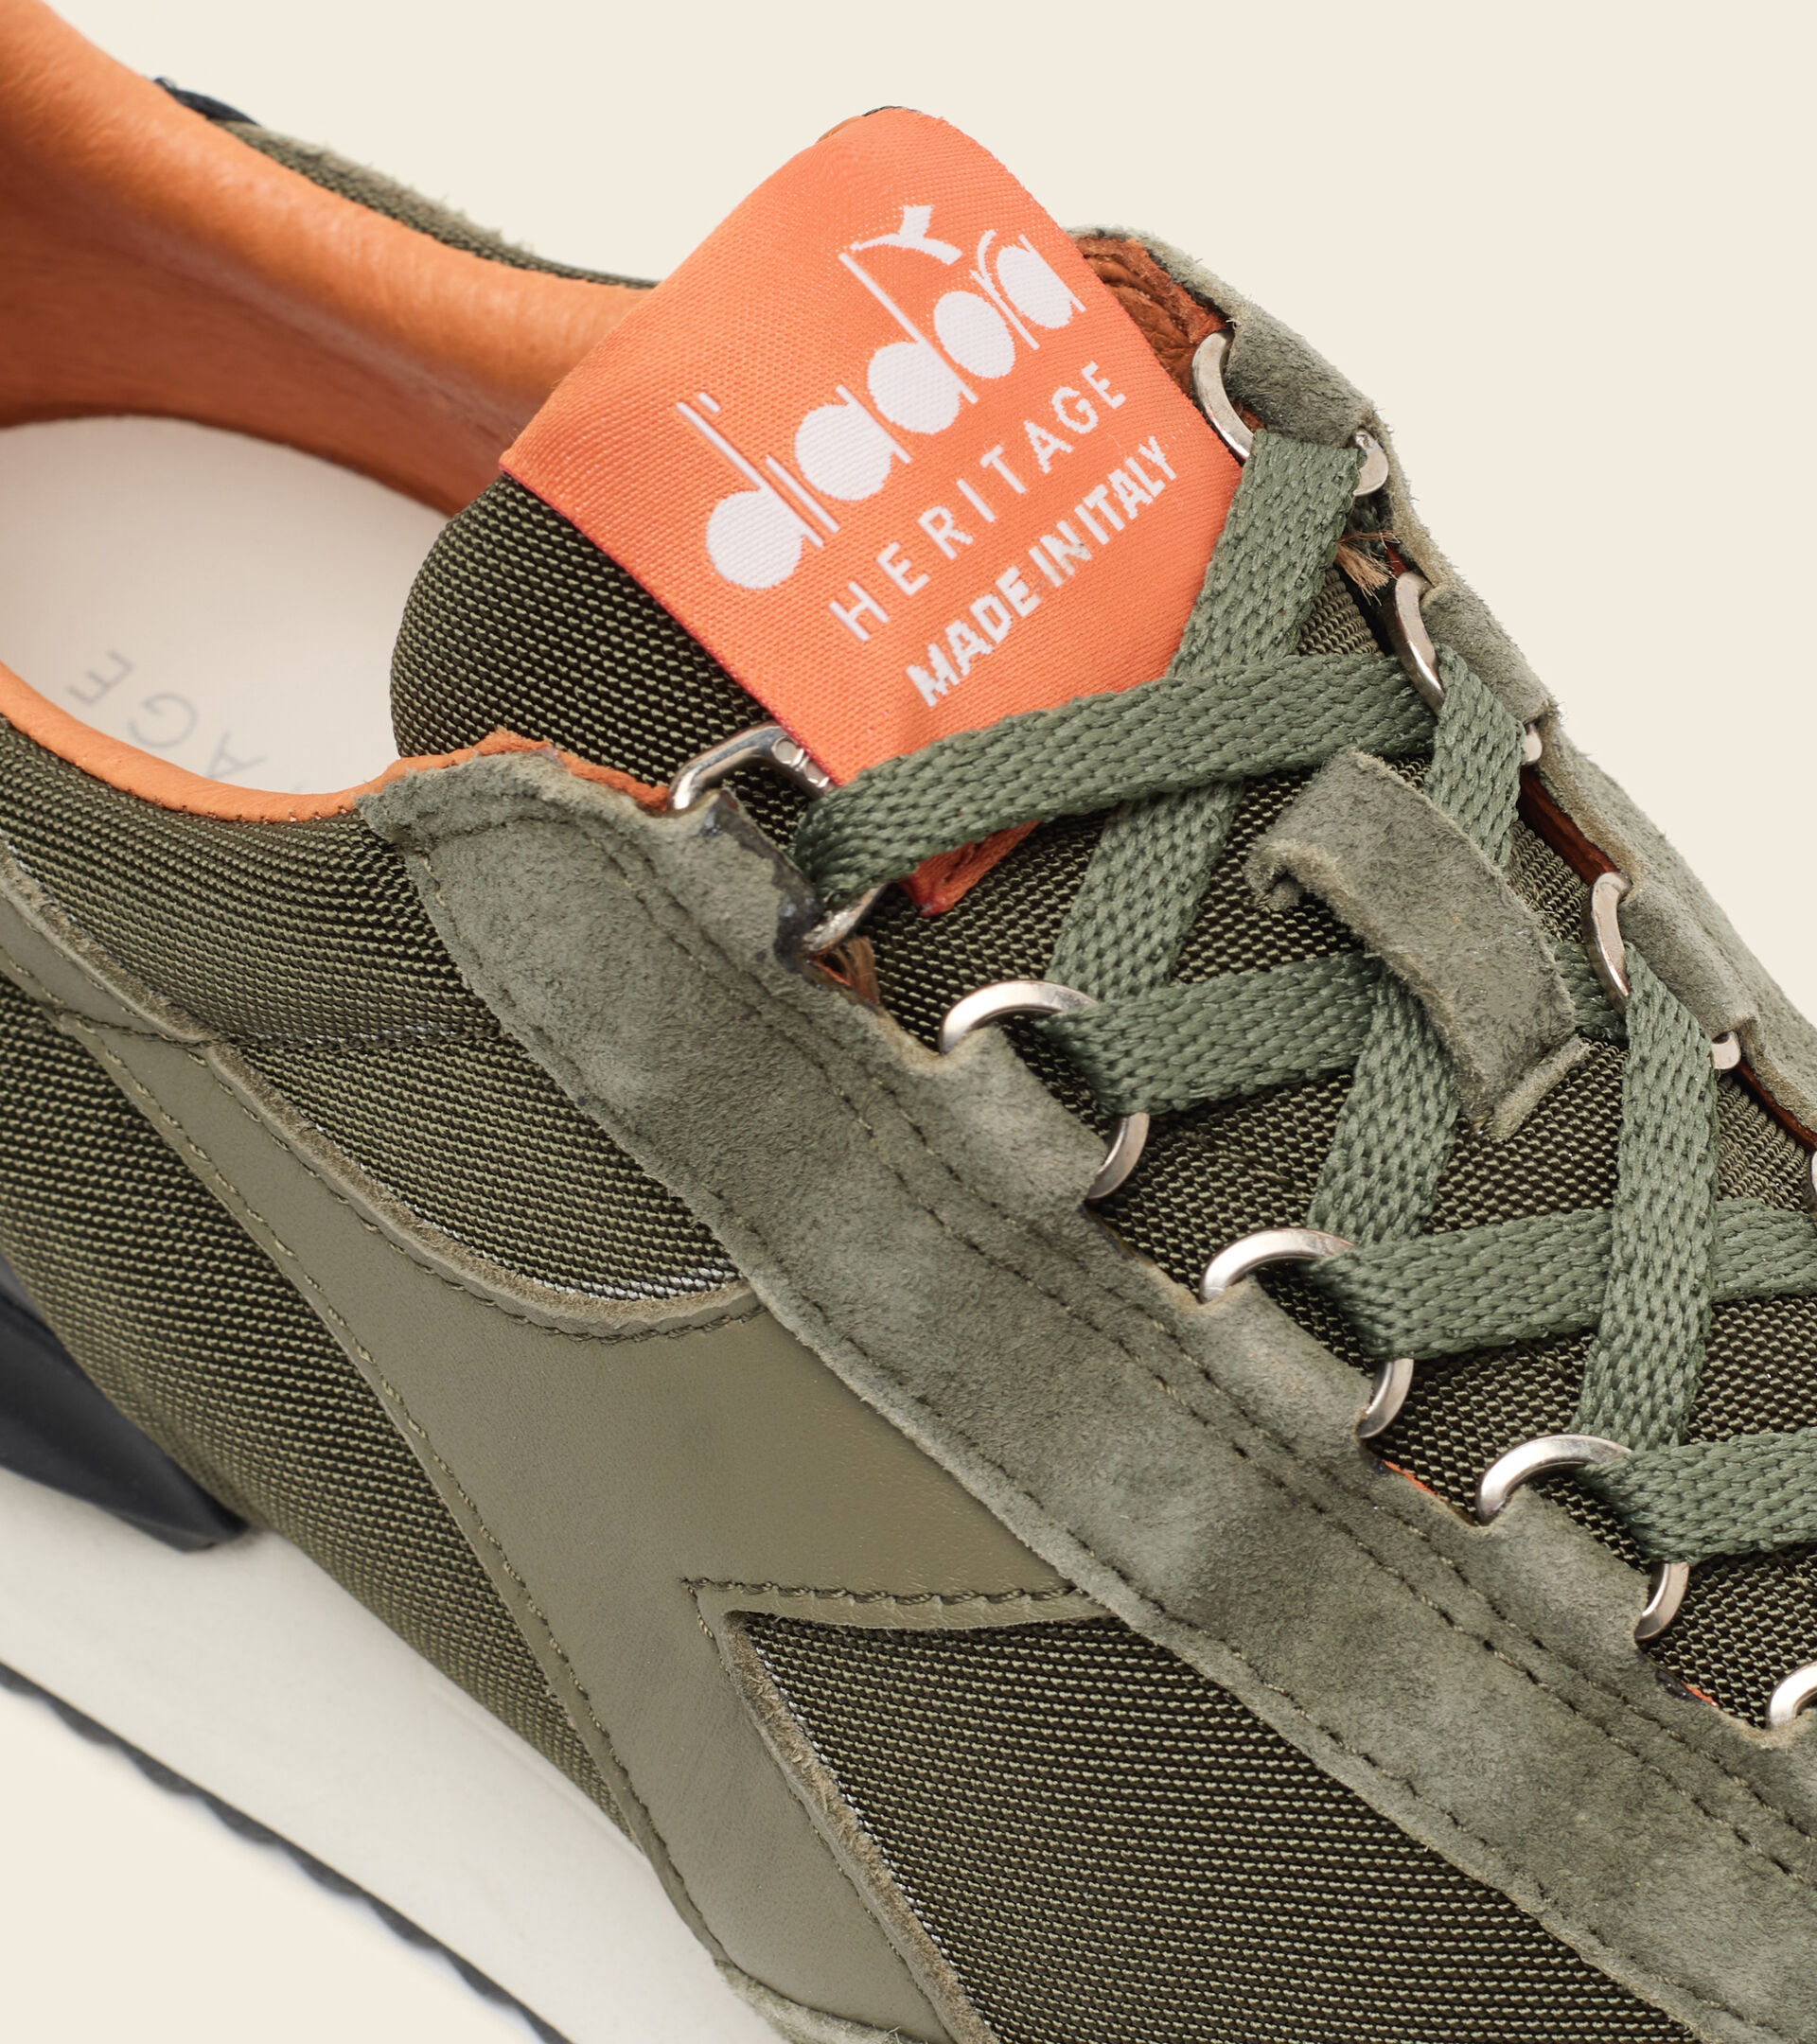 Footwear Heritage UNISEX EQUIPE MAD ITALIA NUBUCK SW OLIVINO Diadora